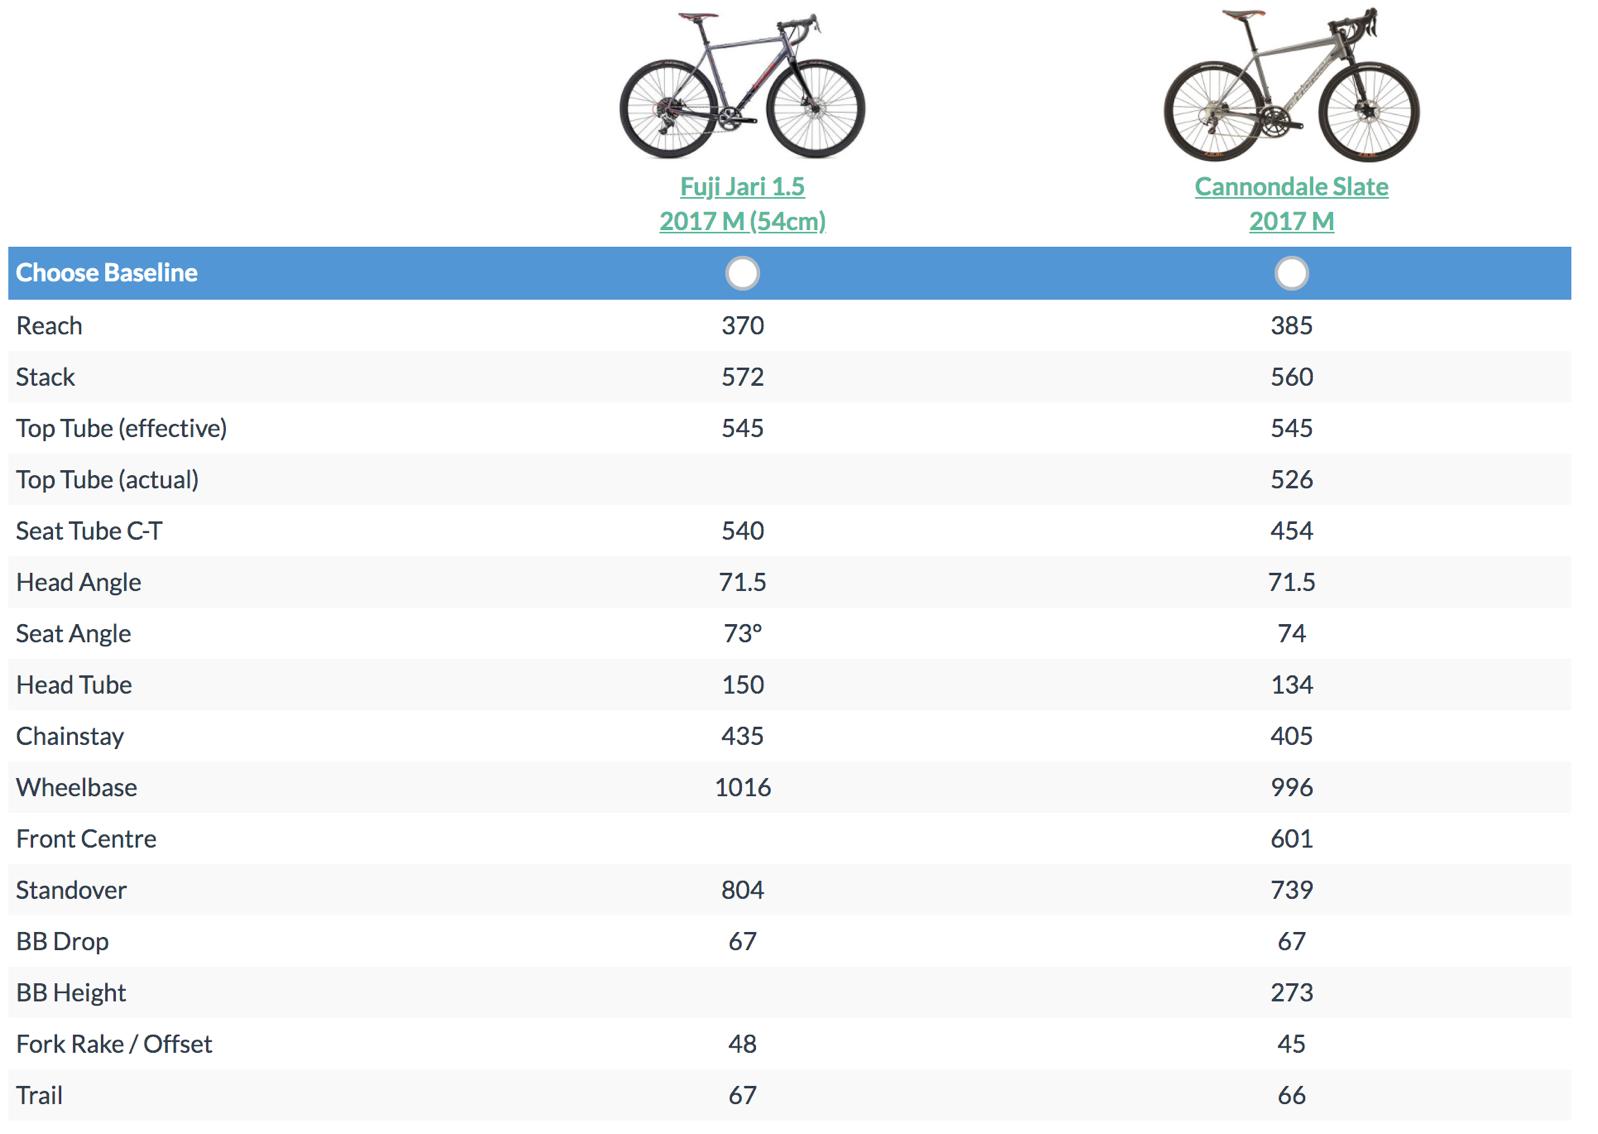 Https geometrygeeks bike compare fuji jari 1 5 2017 m 54cm cannondale slate 2017 m